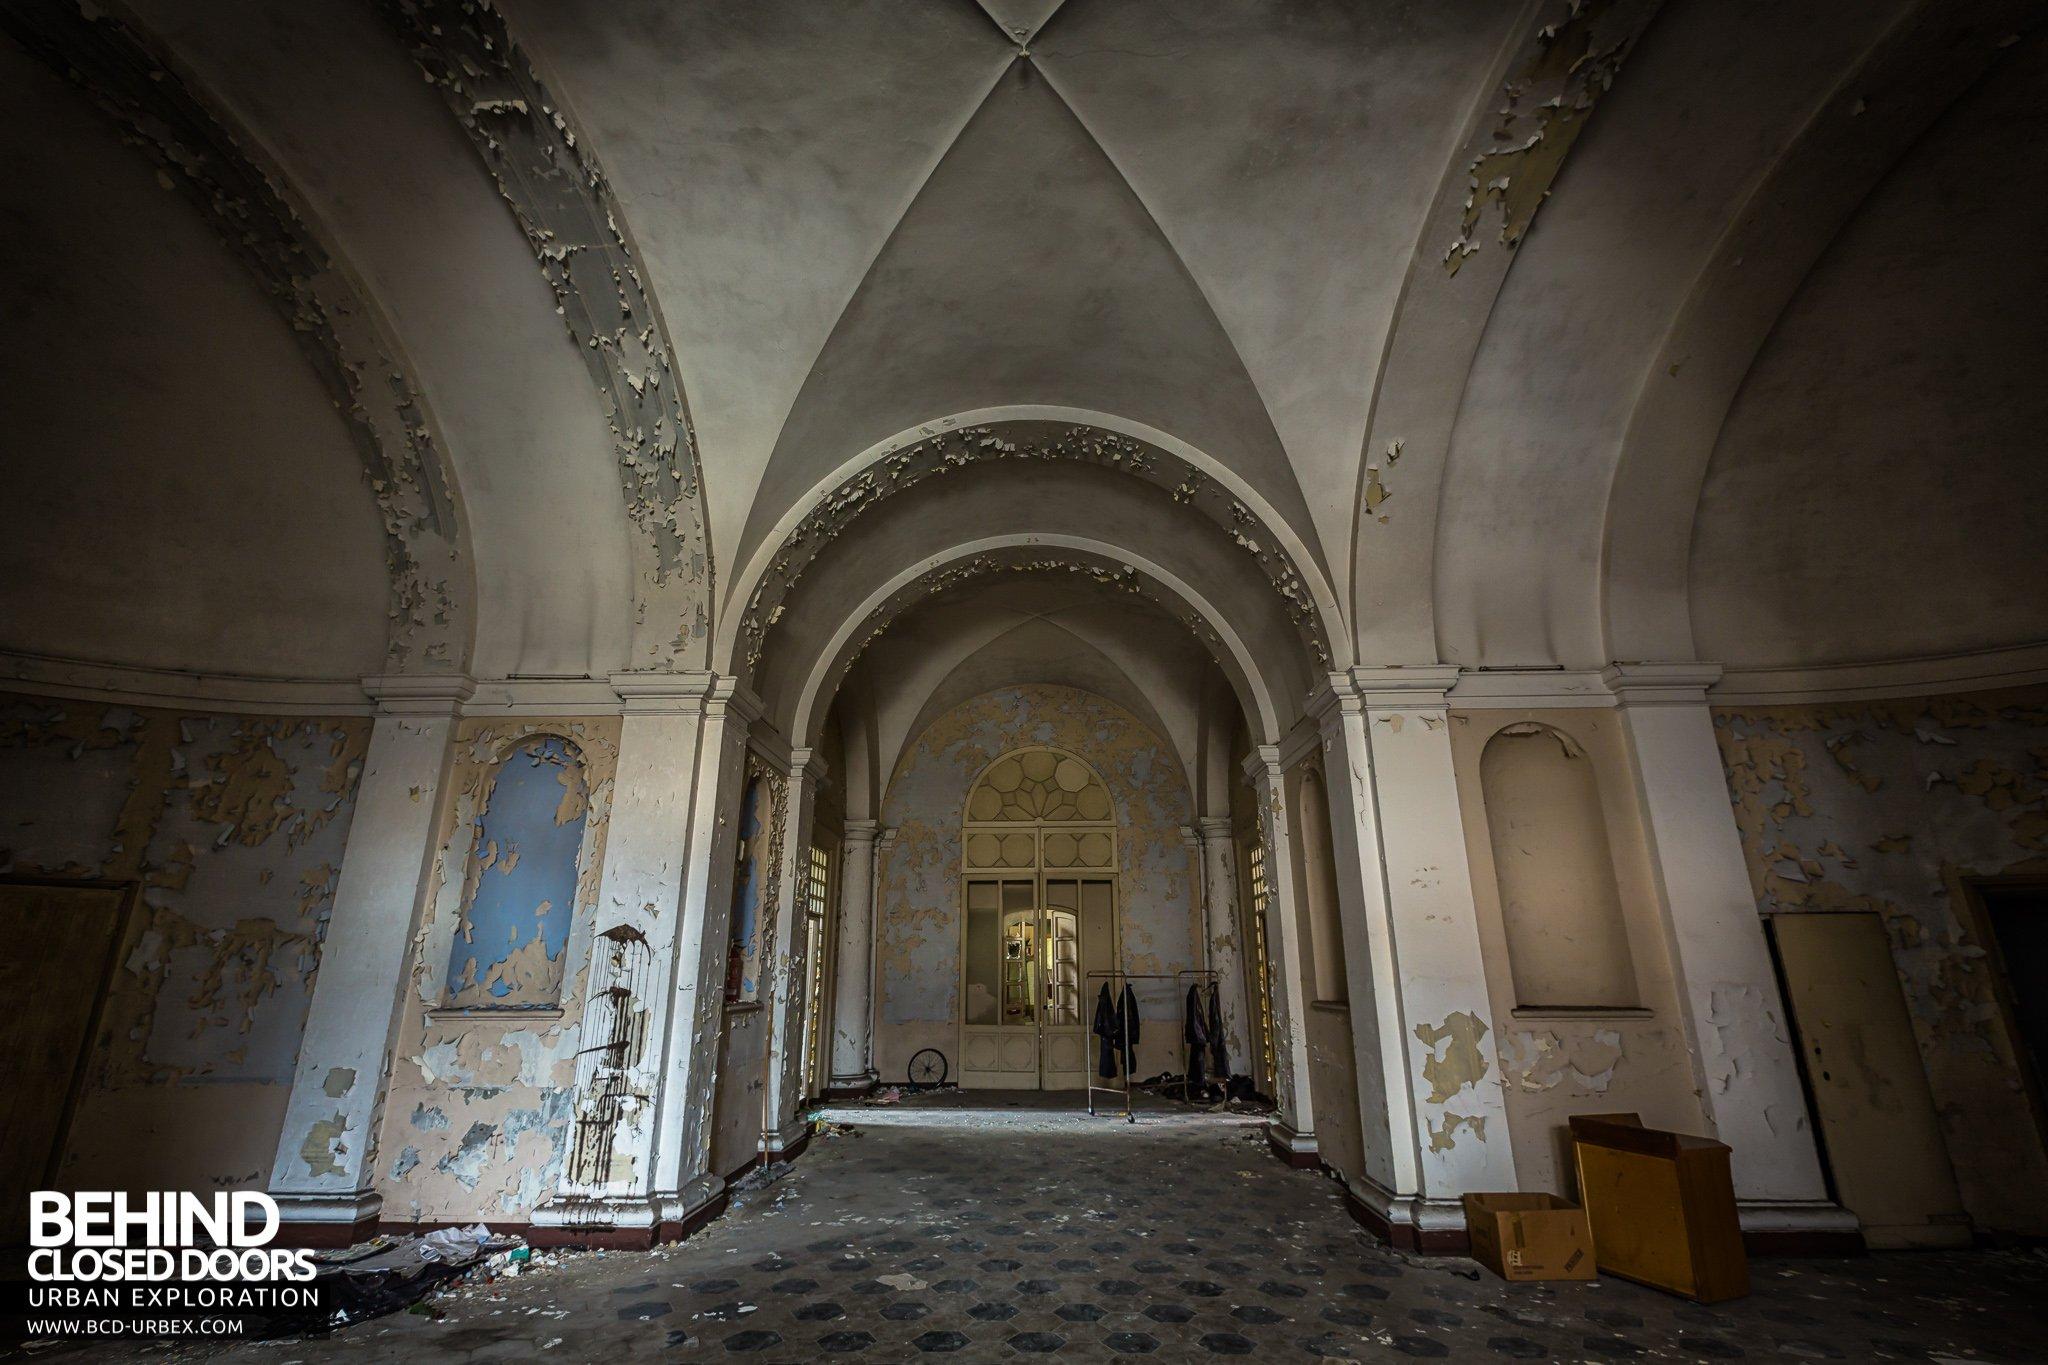 Manicomio di c abandoned asylum italy urbex behind for Grand entrances